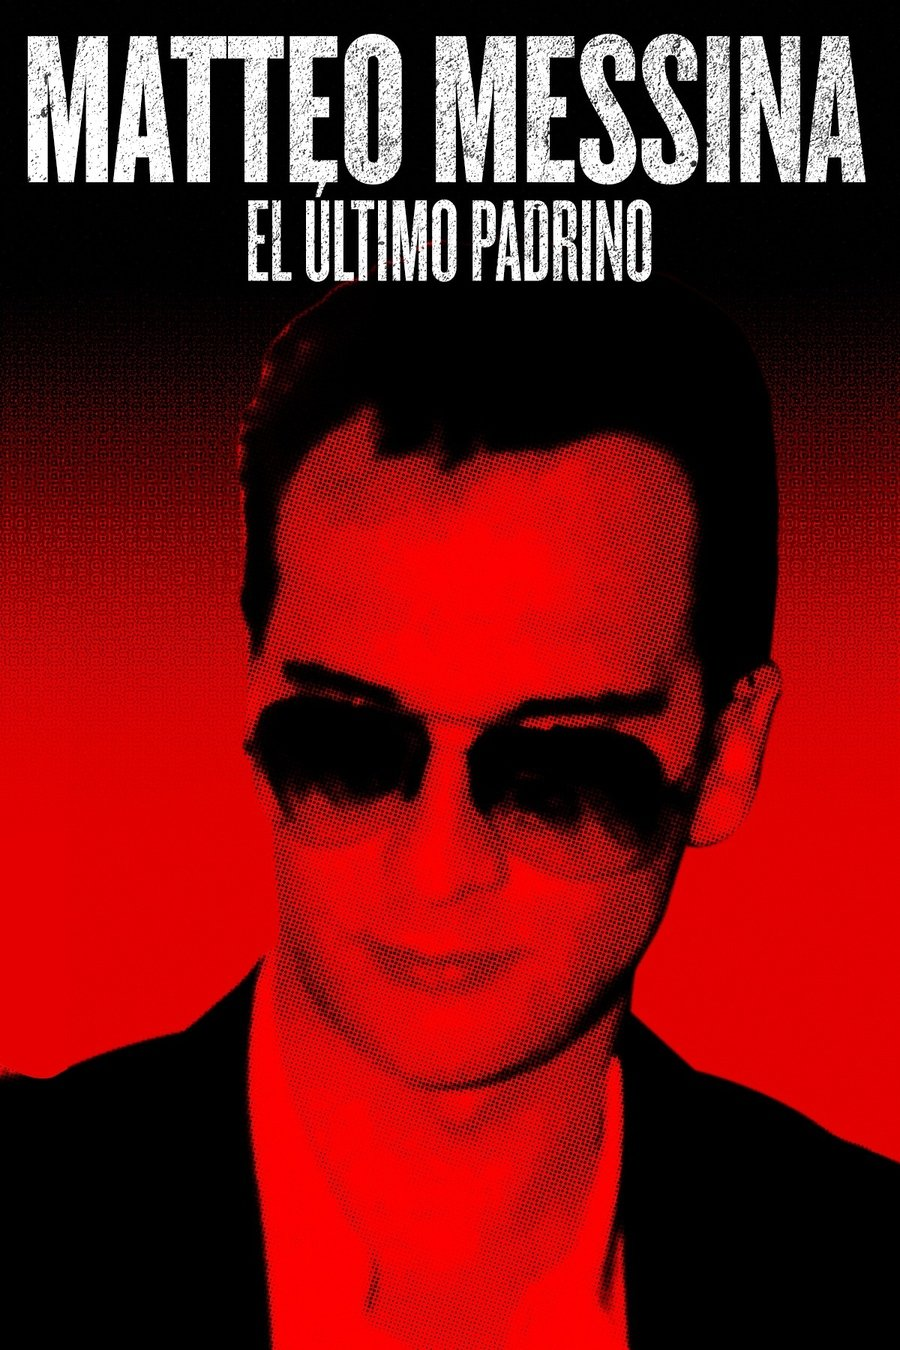 Matteo Messina: El último padrino